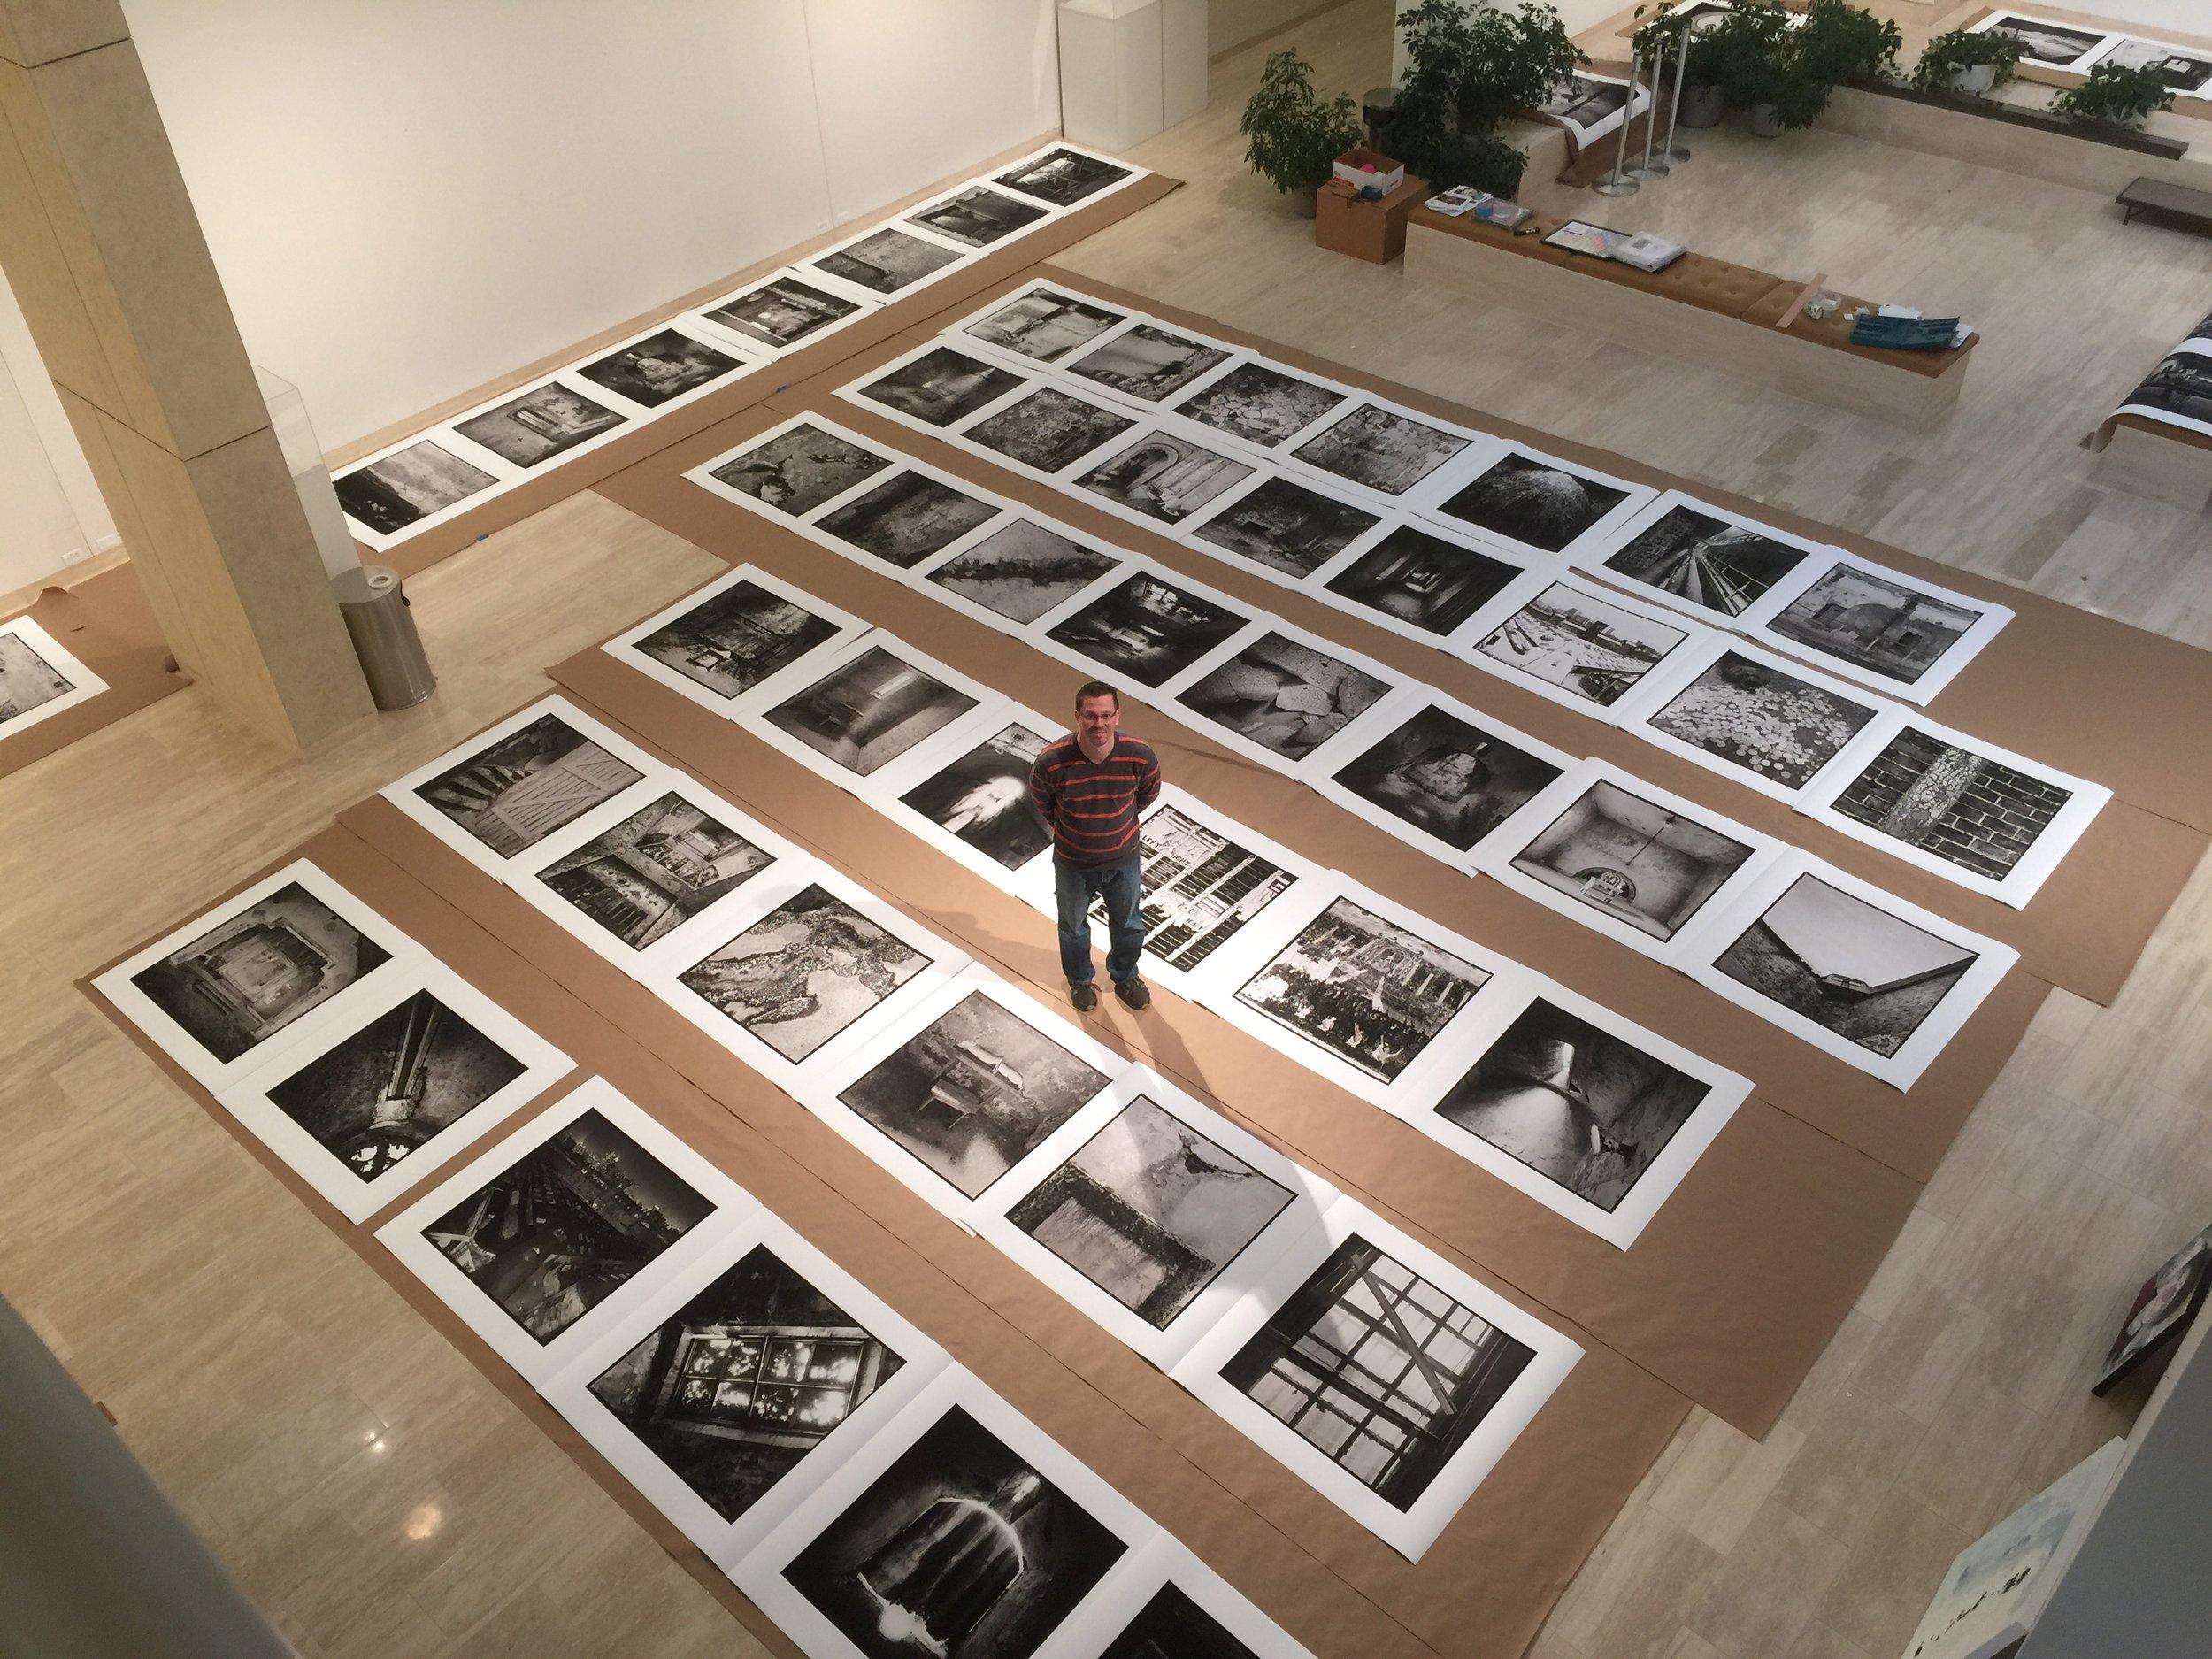 Self-Portrait during installation. Photograph Courtesy of David Arkin